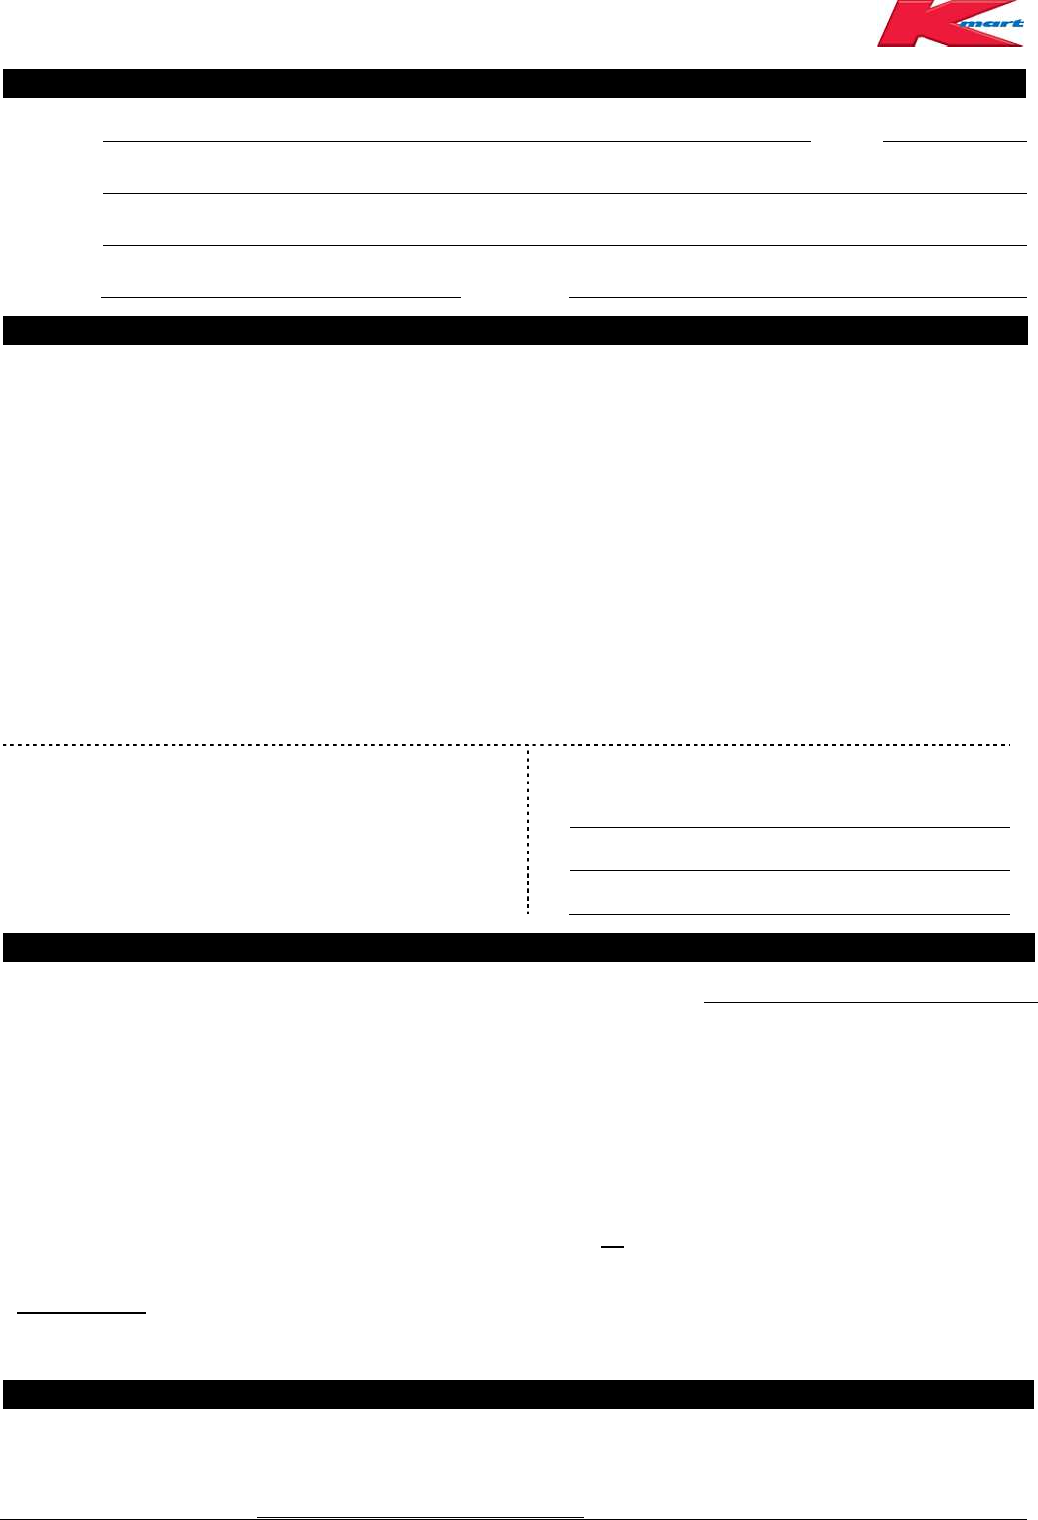 Free printable kmart job application form falaconquin